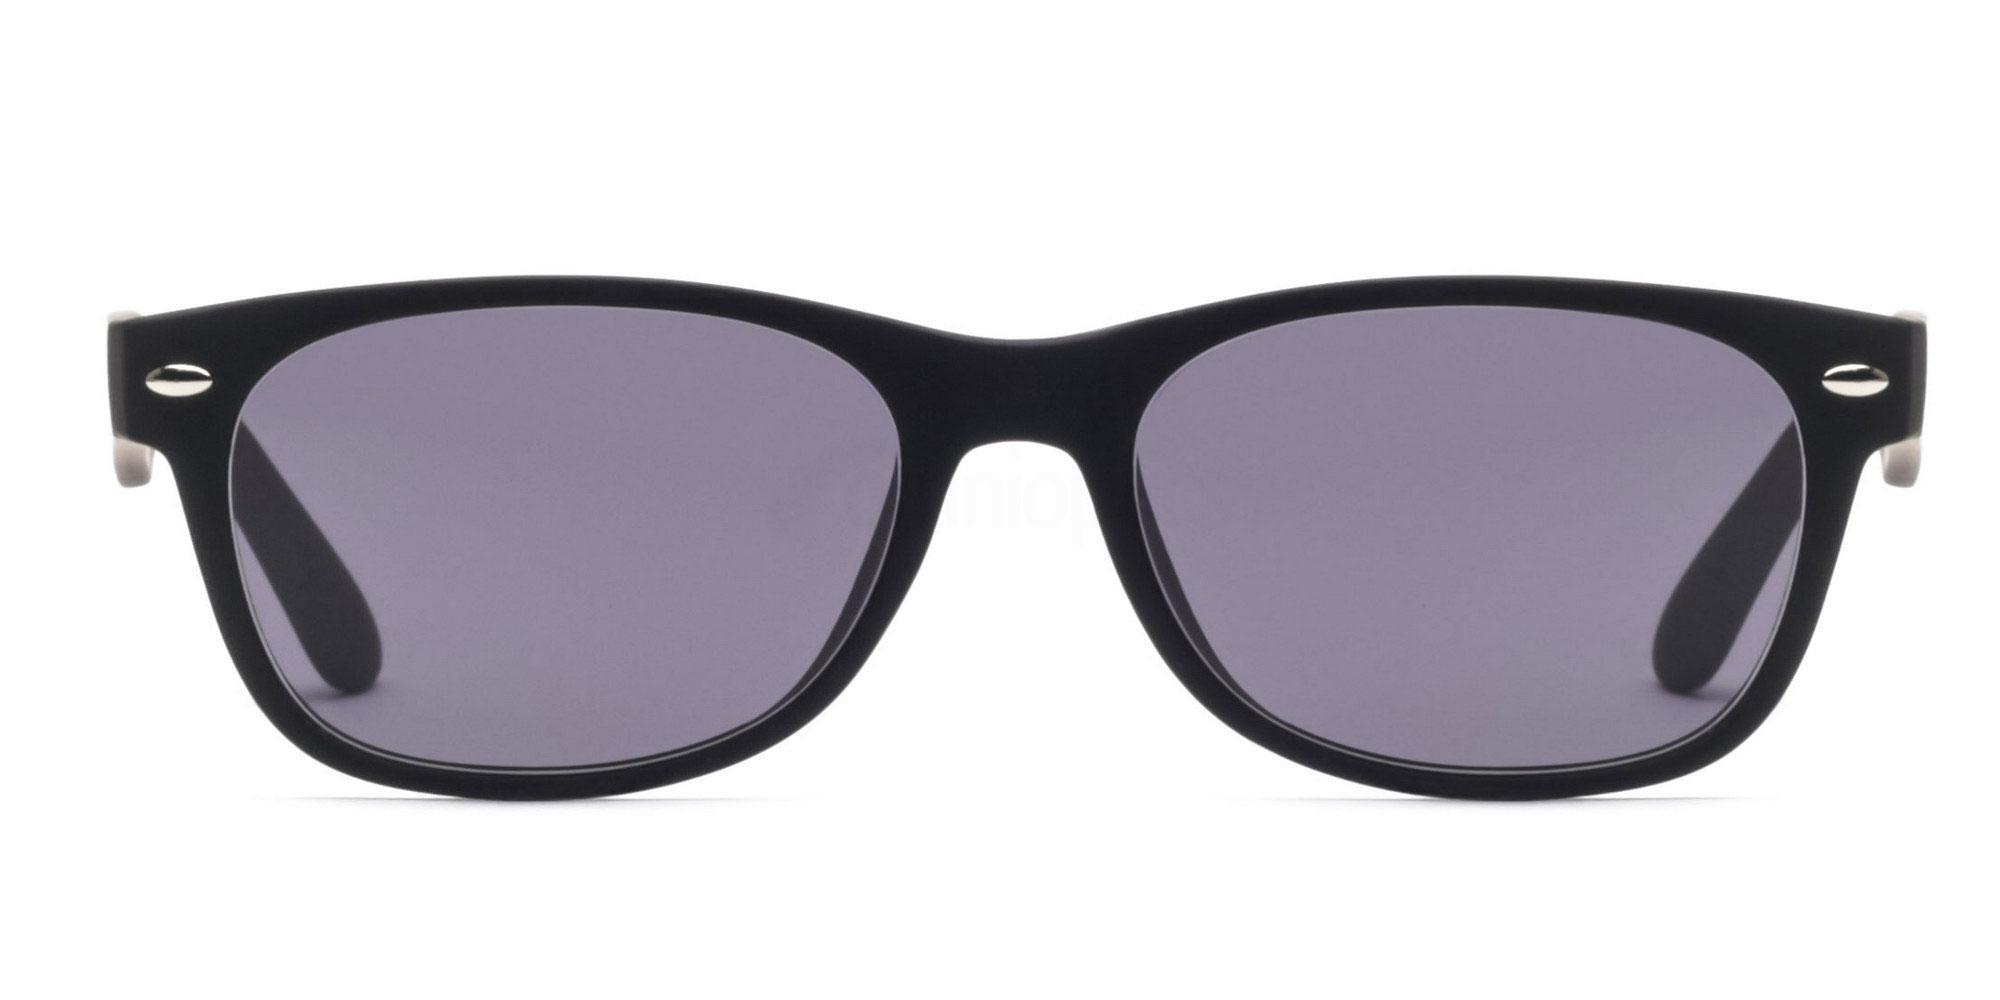 Black S8122 - Black (Sunglasses) , Savannah